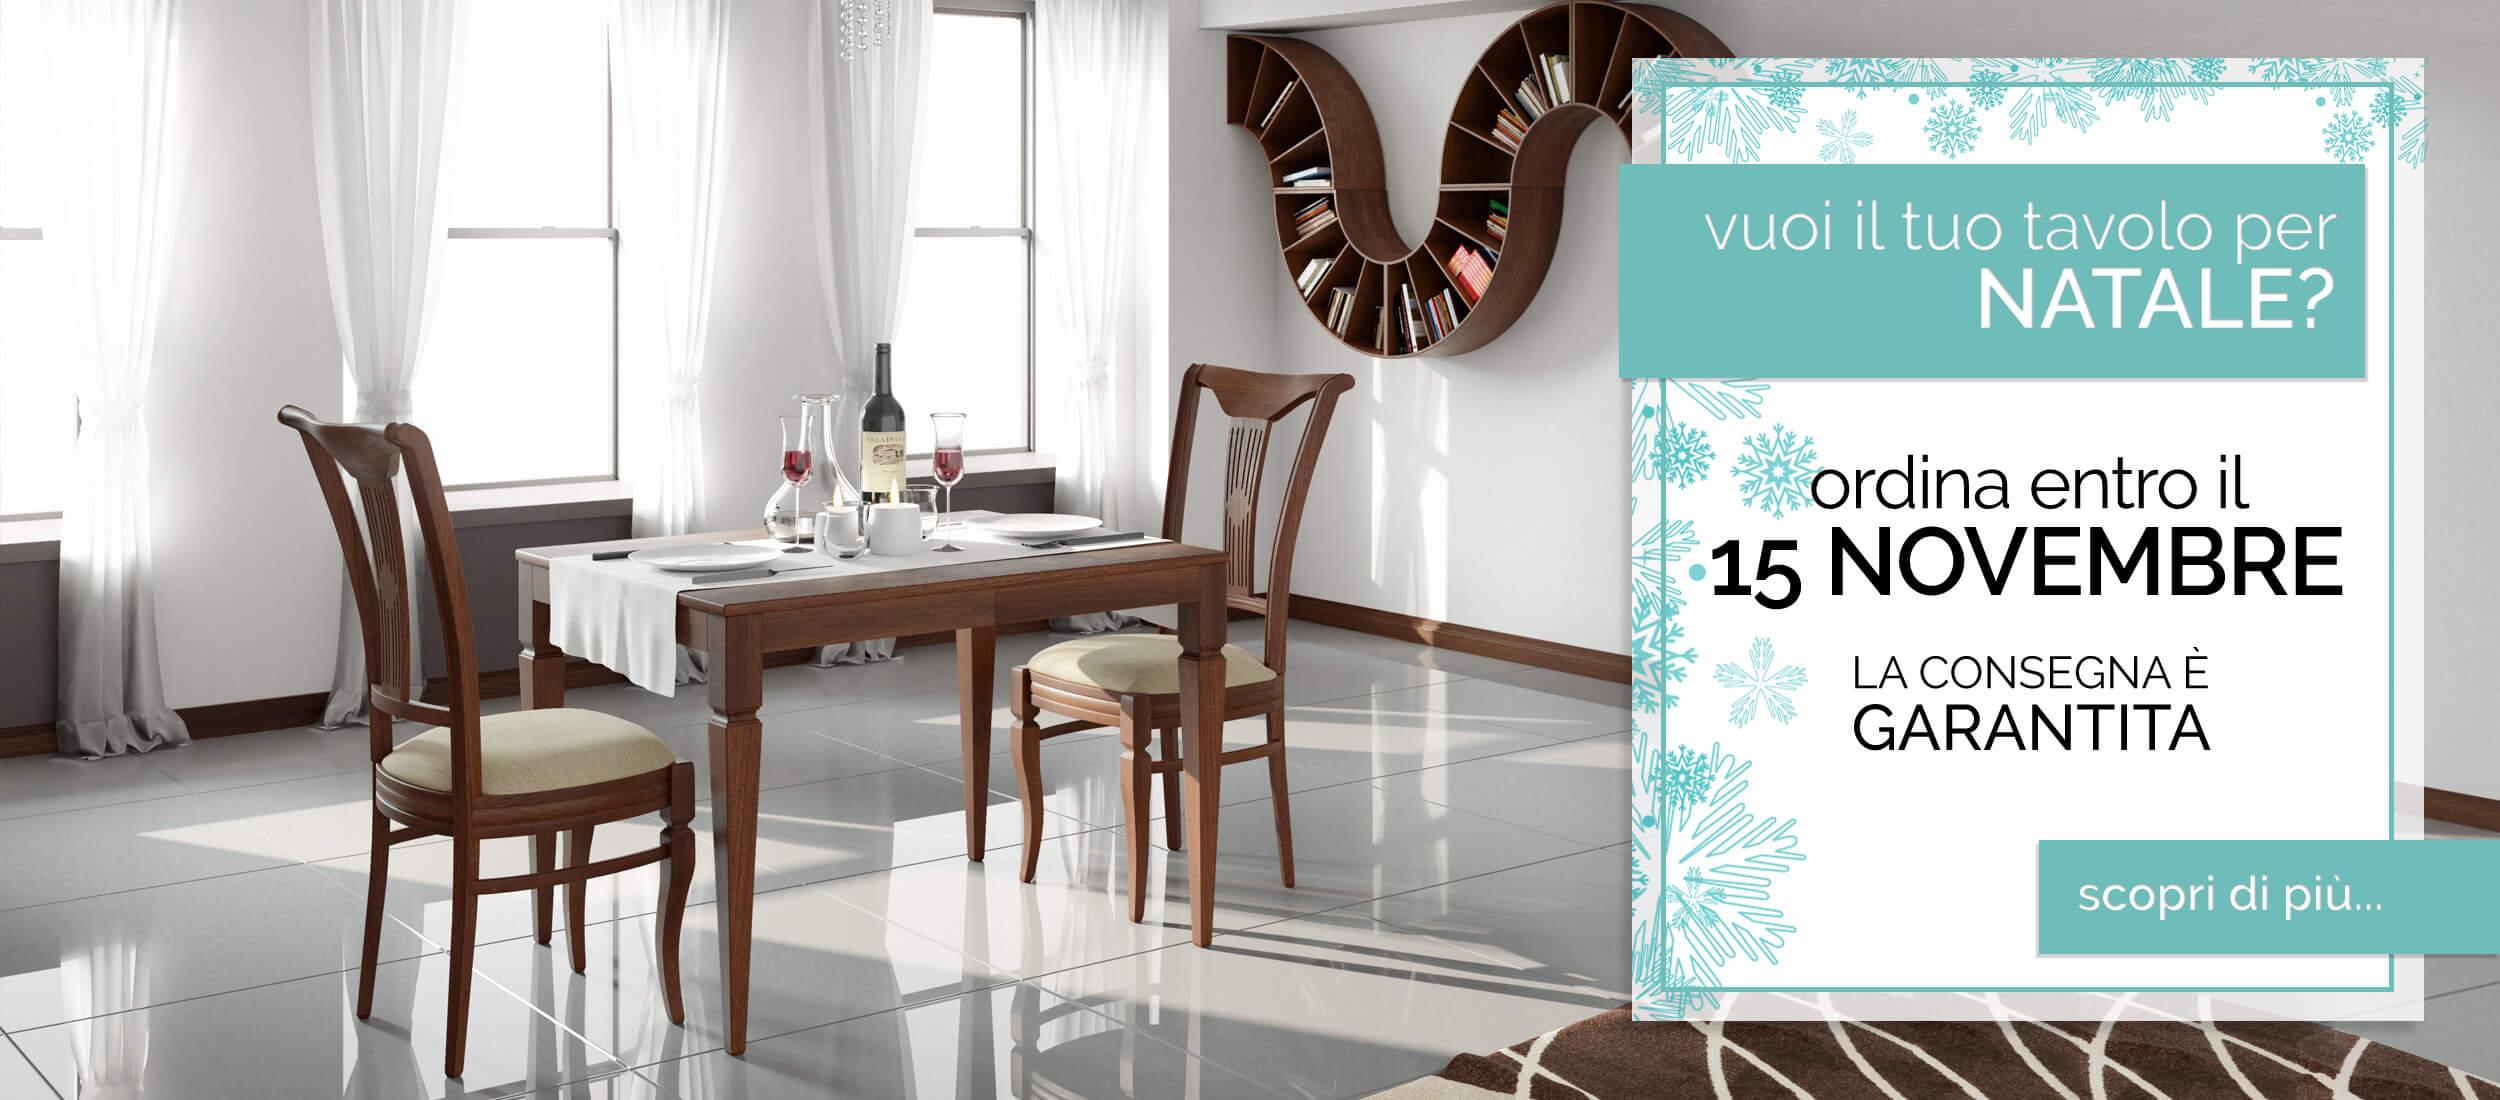 tavoli-allungabili-consegna-garantita_desk